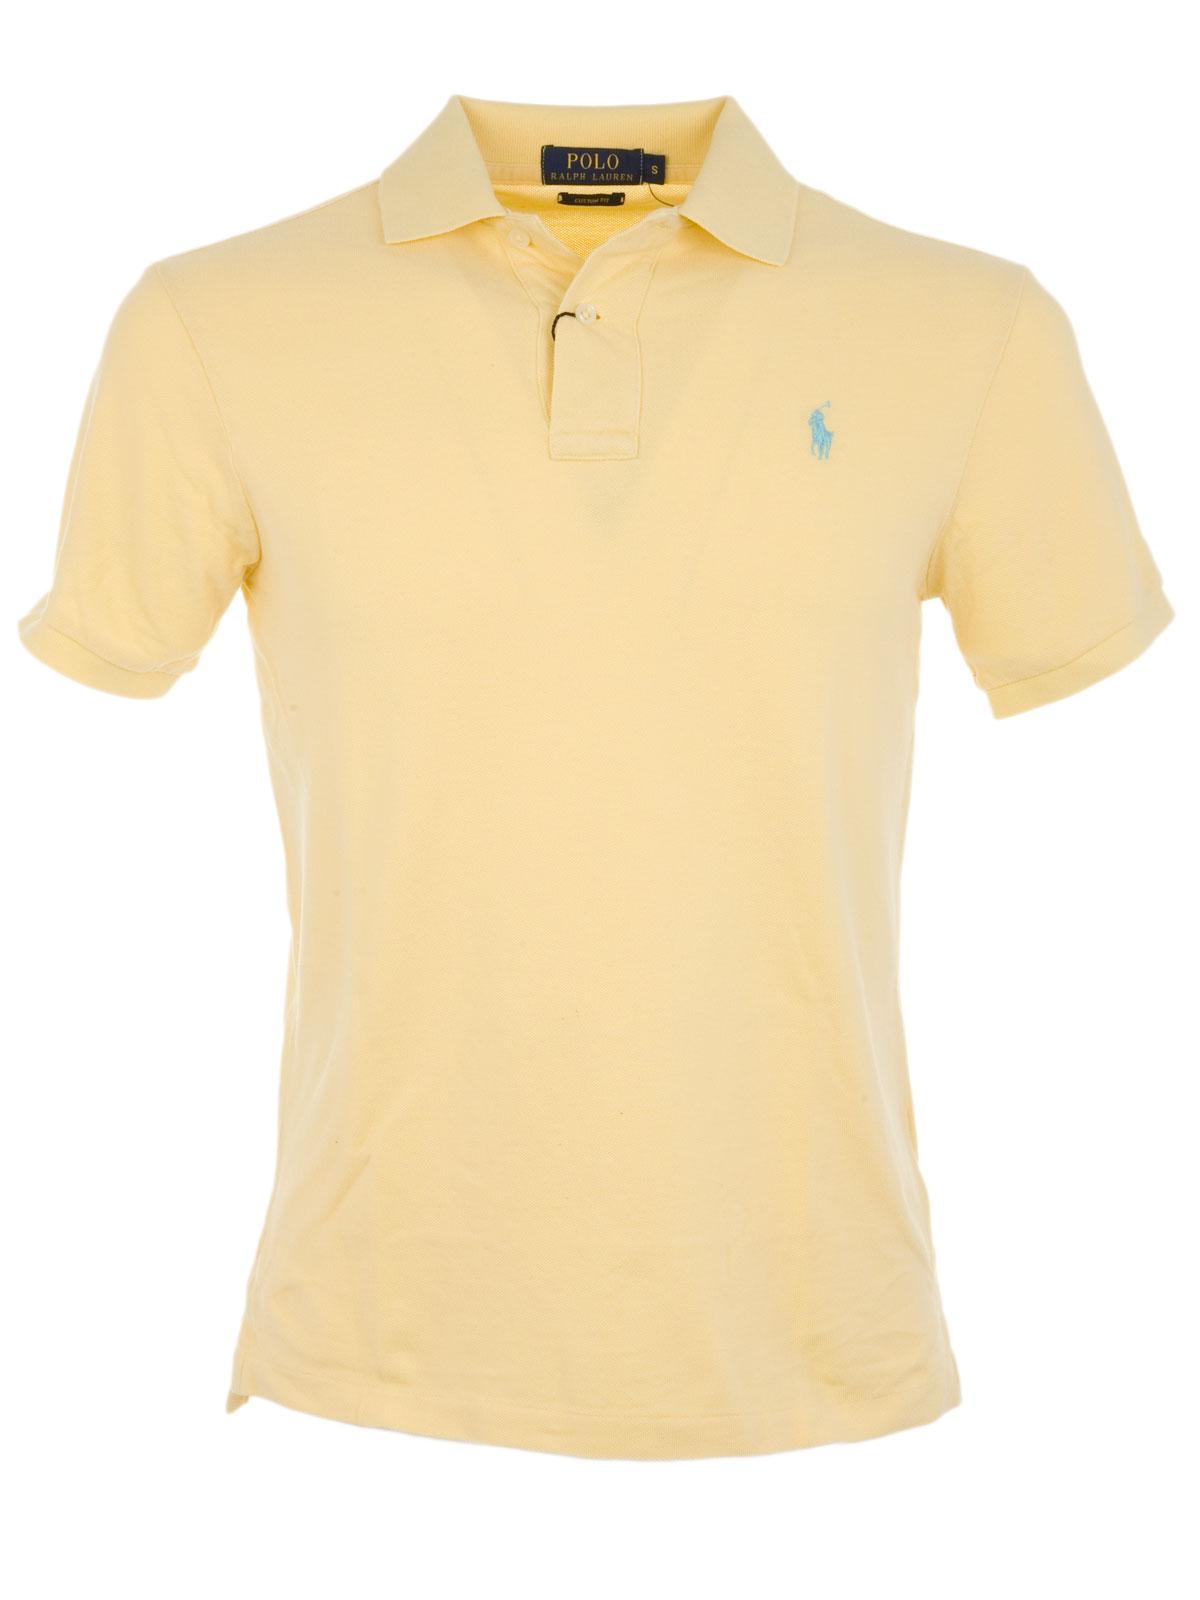 Polo ralph lauren custom fit polo shirt xw7lz for Polo ralph lauren custom fit polo shirt